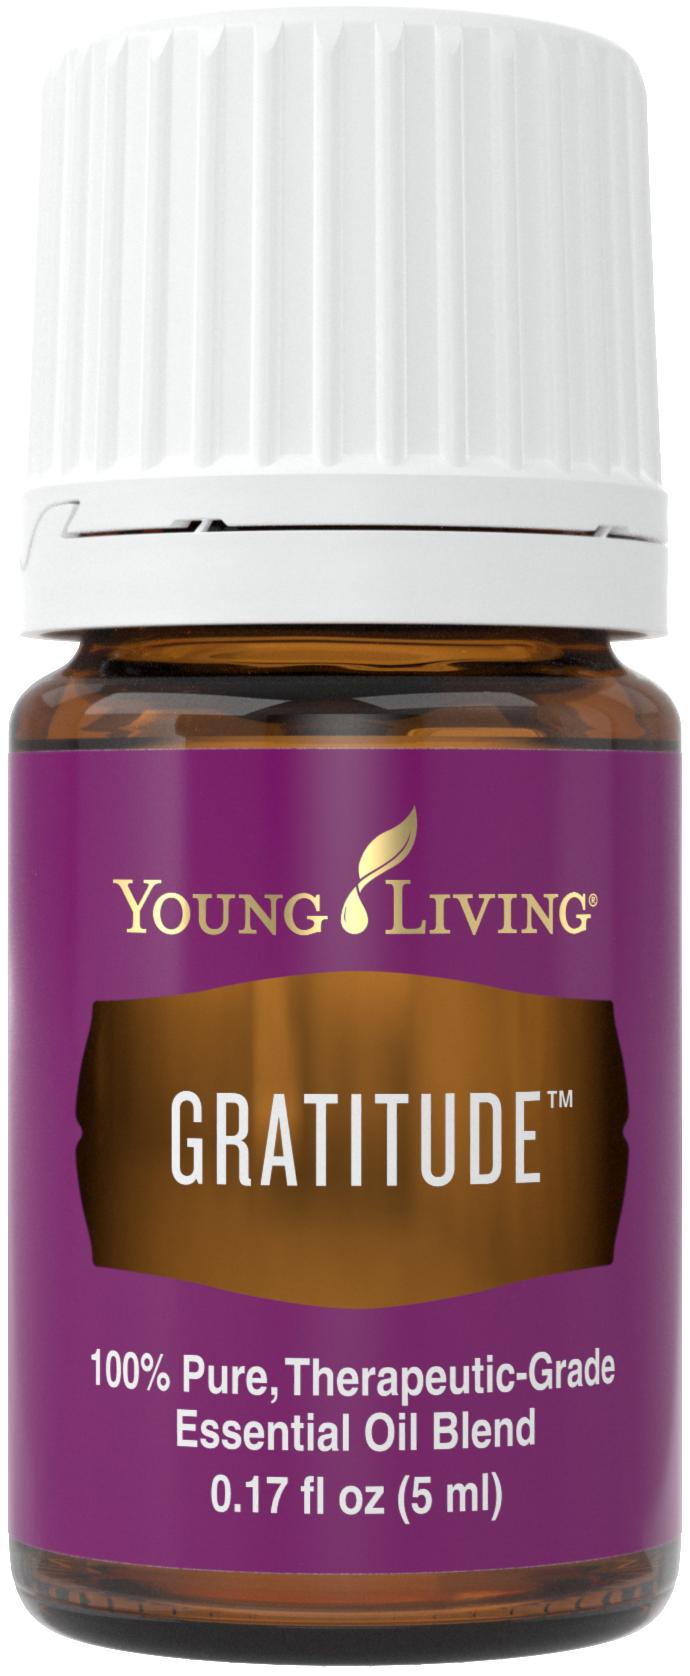 gratitude_5ml_silo_us_2016_23900379353_o